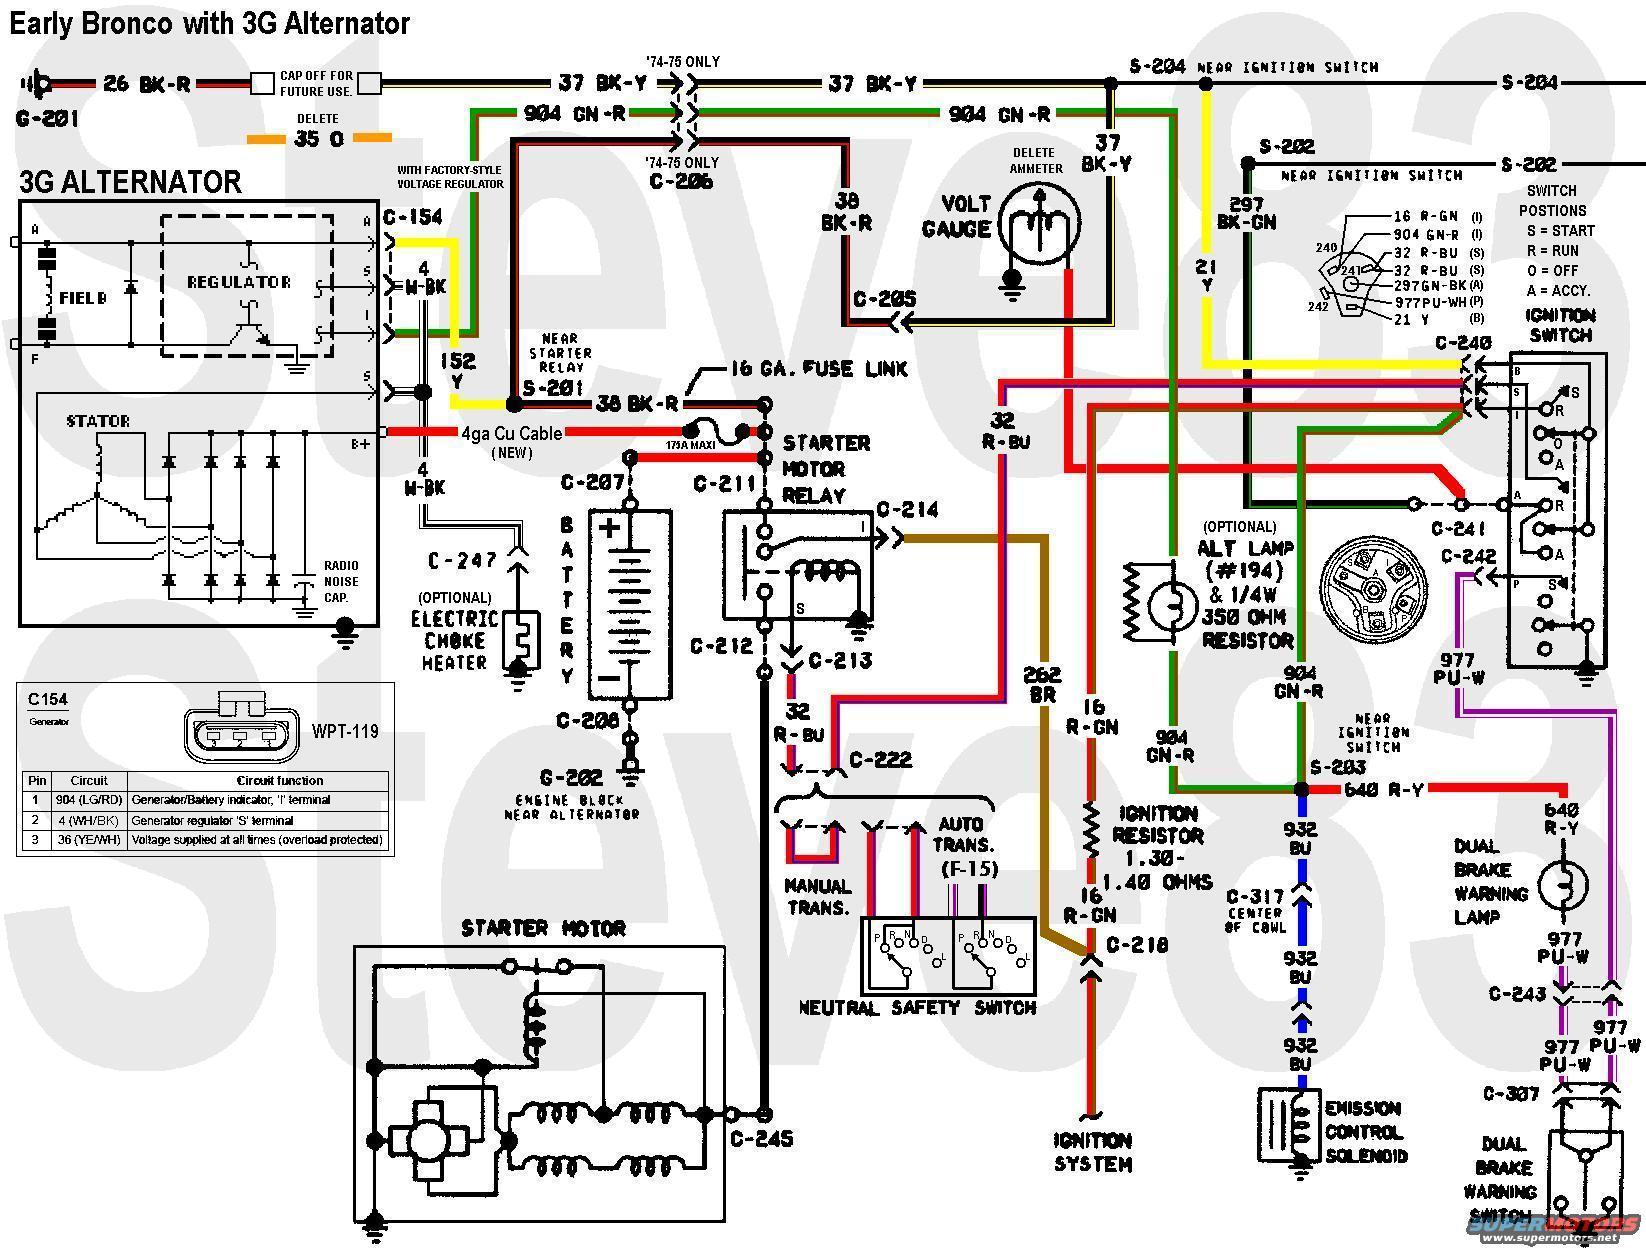 early bronco wiring diagram 2004 klr 650 restoration